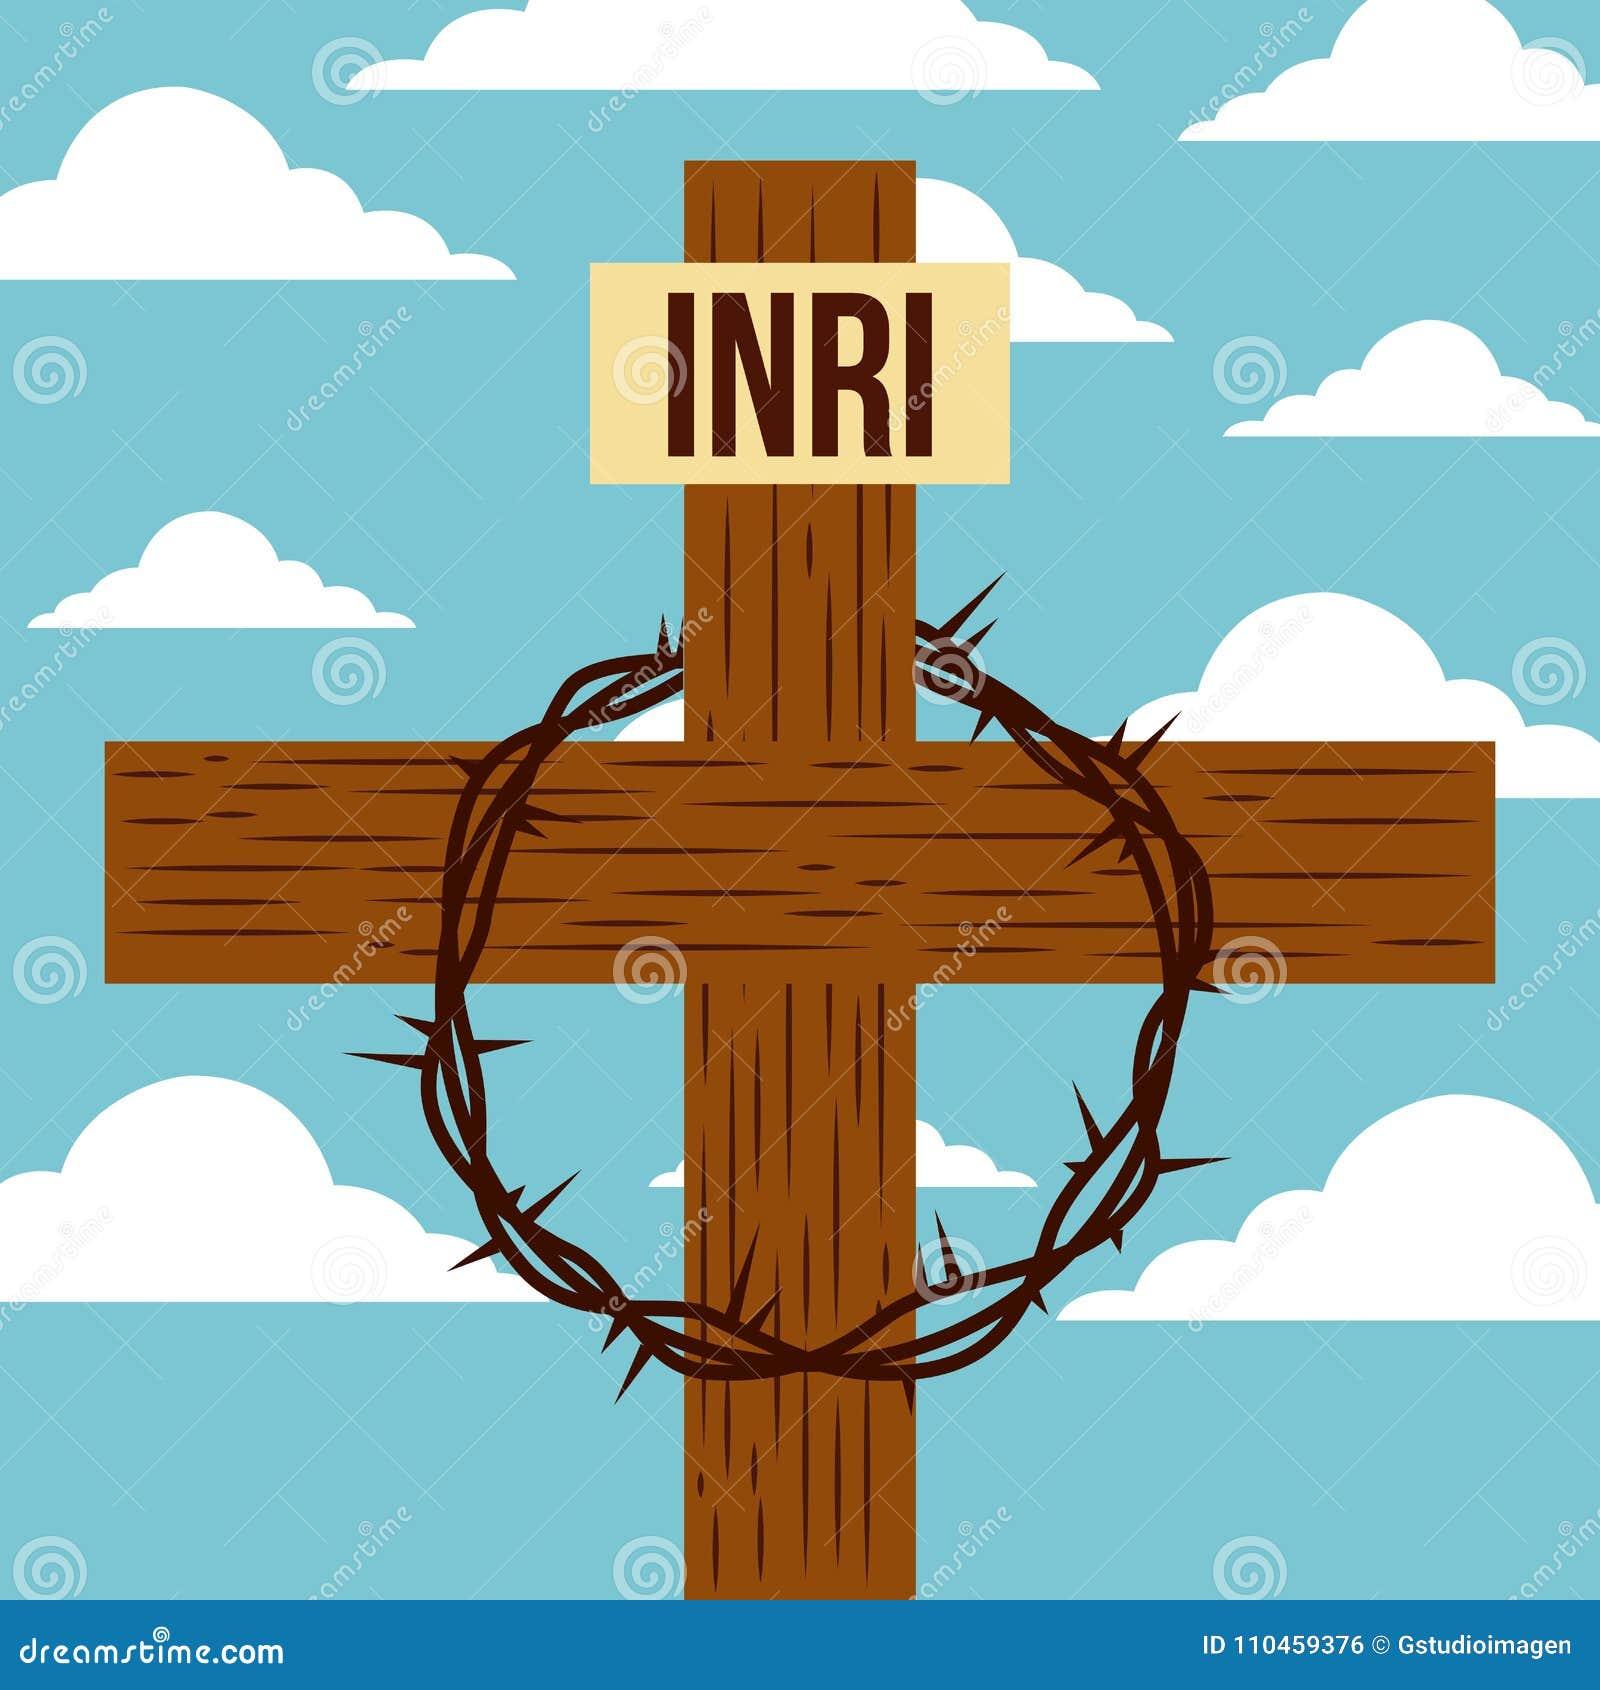 Bra fredag jesus korskrona av taggar